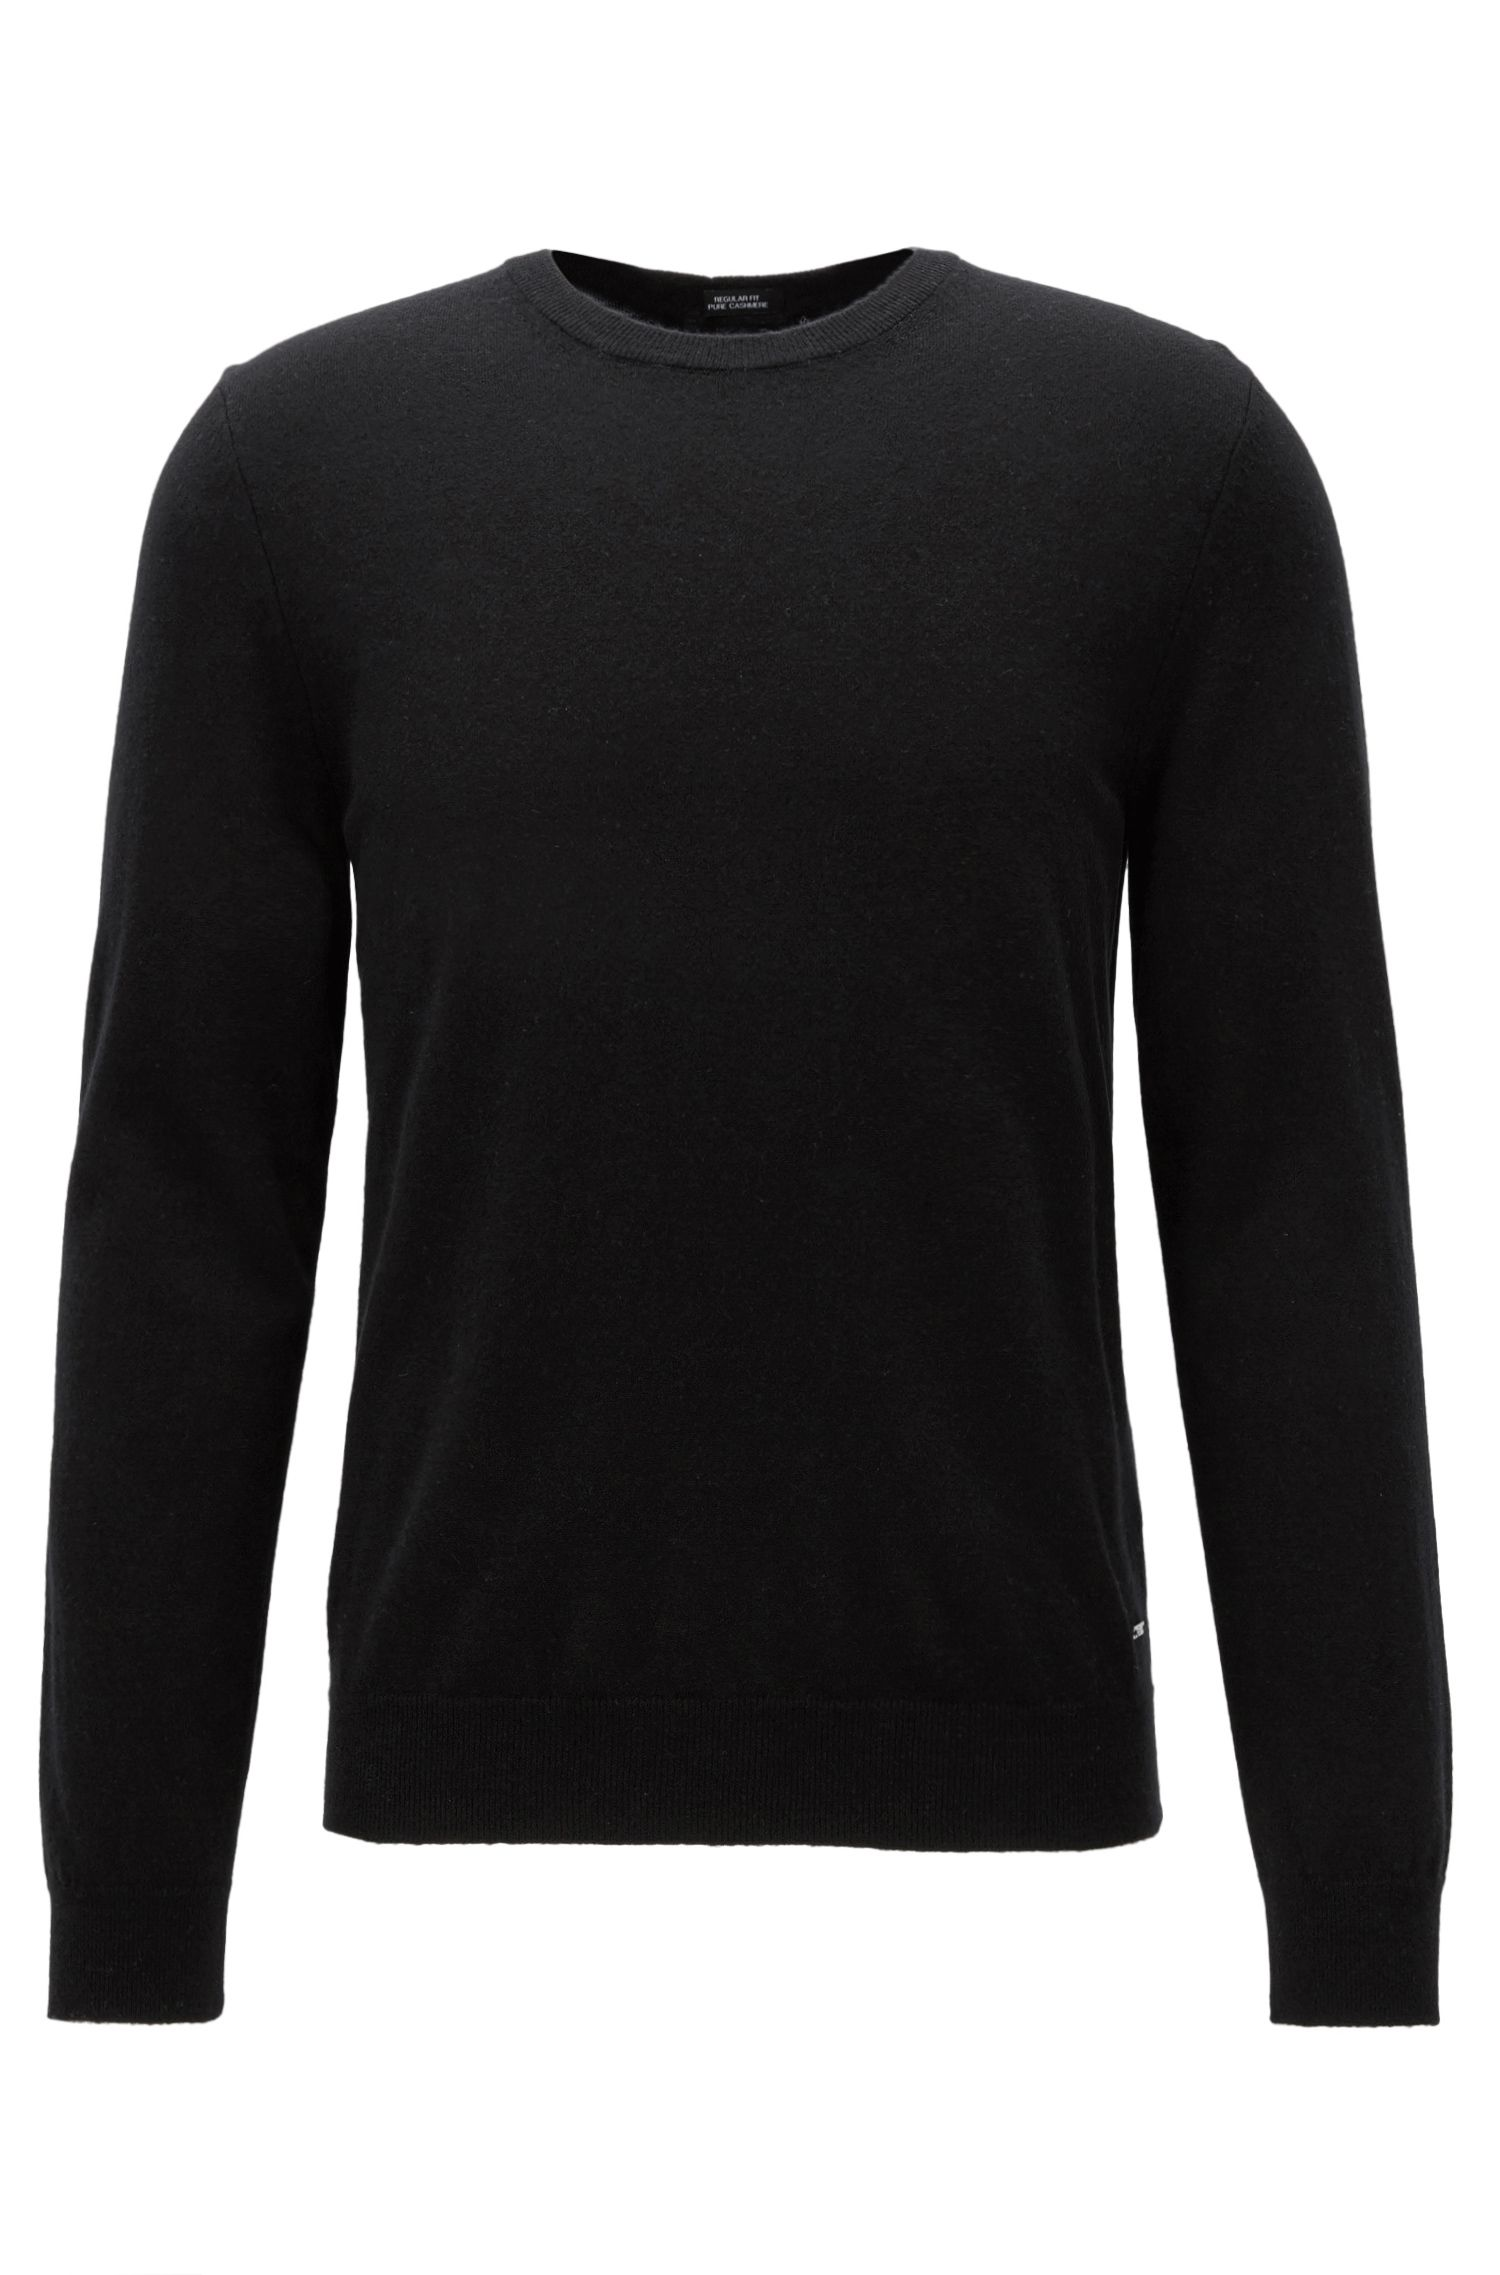 Lightweight sweater in Italian cashmere